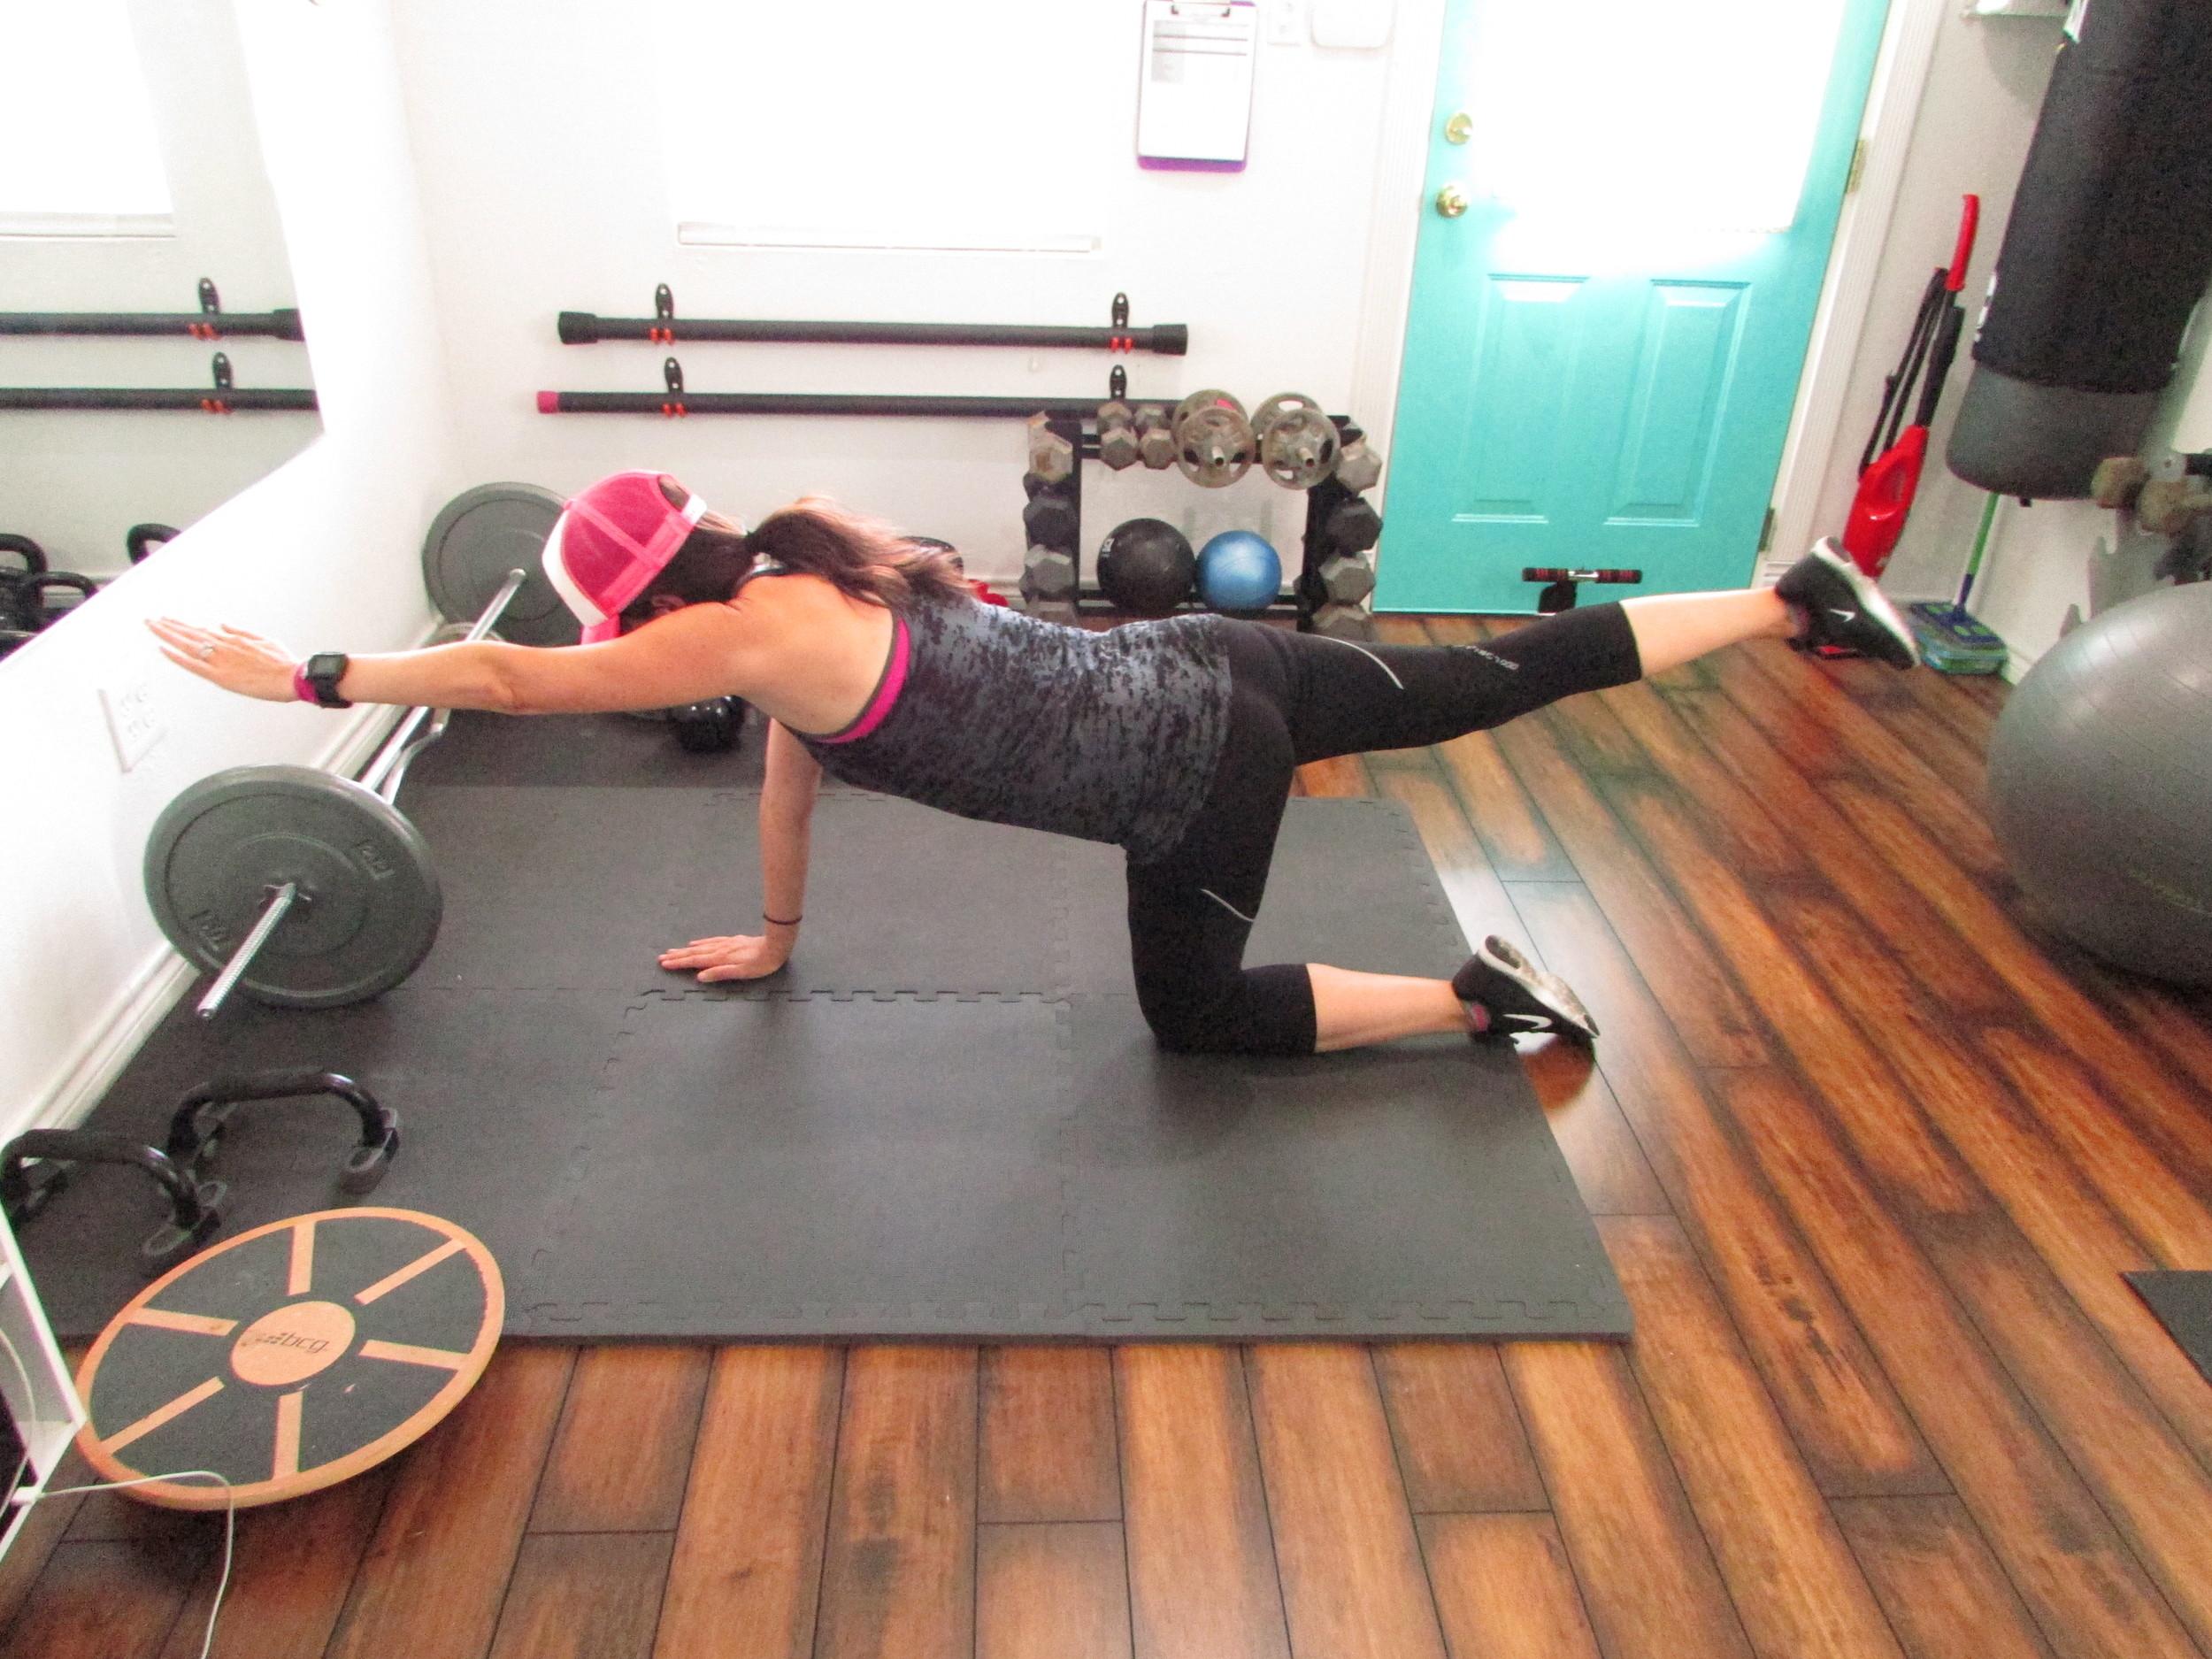 Lea Genders Fitness Bird dog core exercise